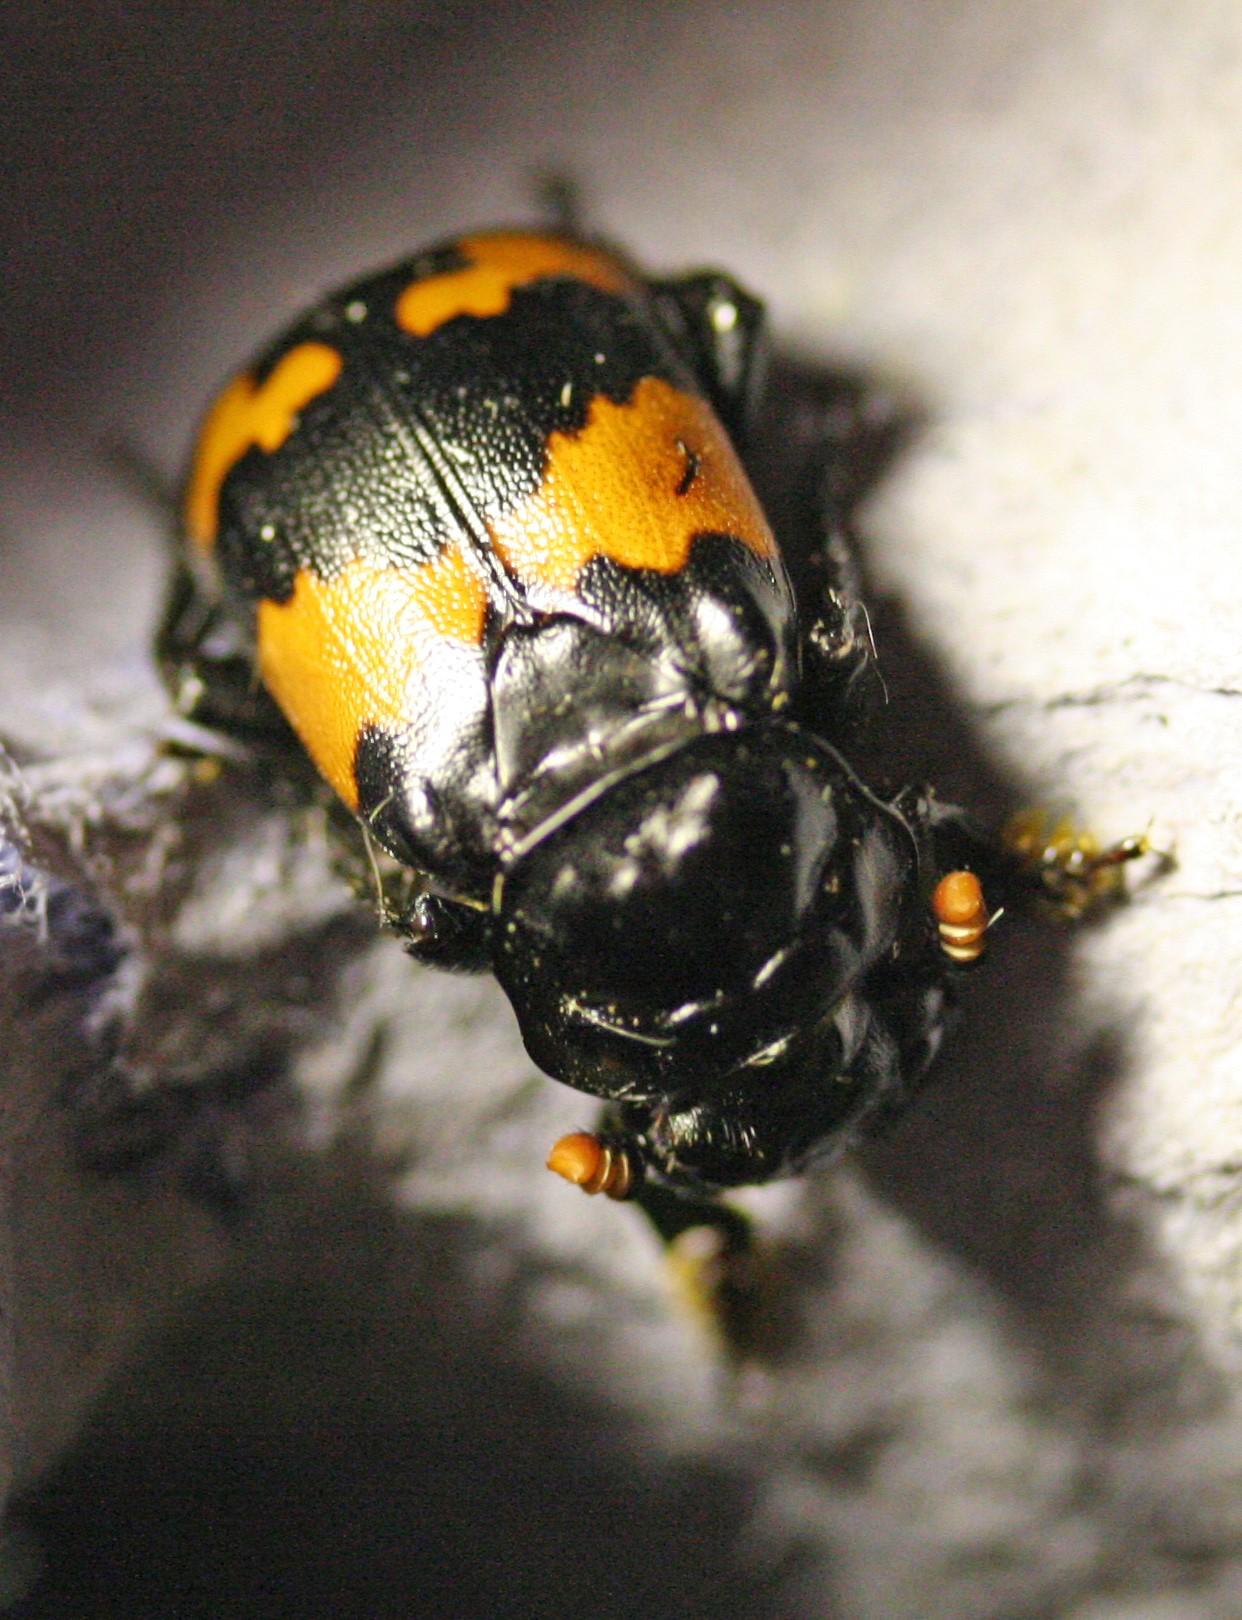 sexton-beetle-35c13f86c9340ffbe76e5b2022c0c3de1e0f8bf4